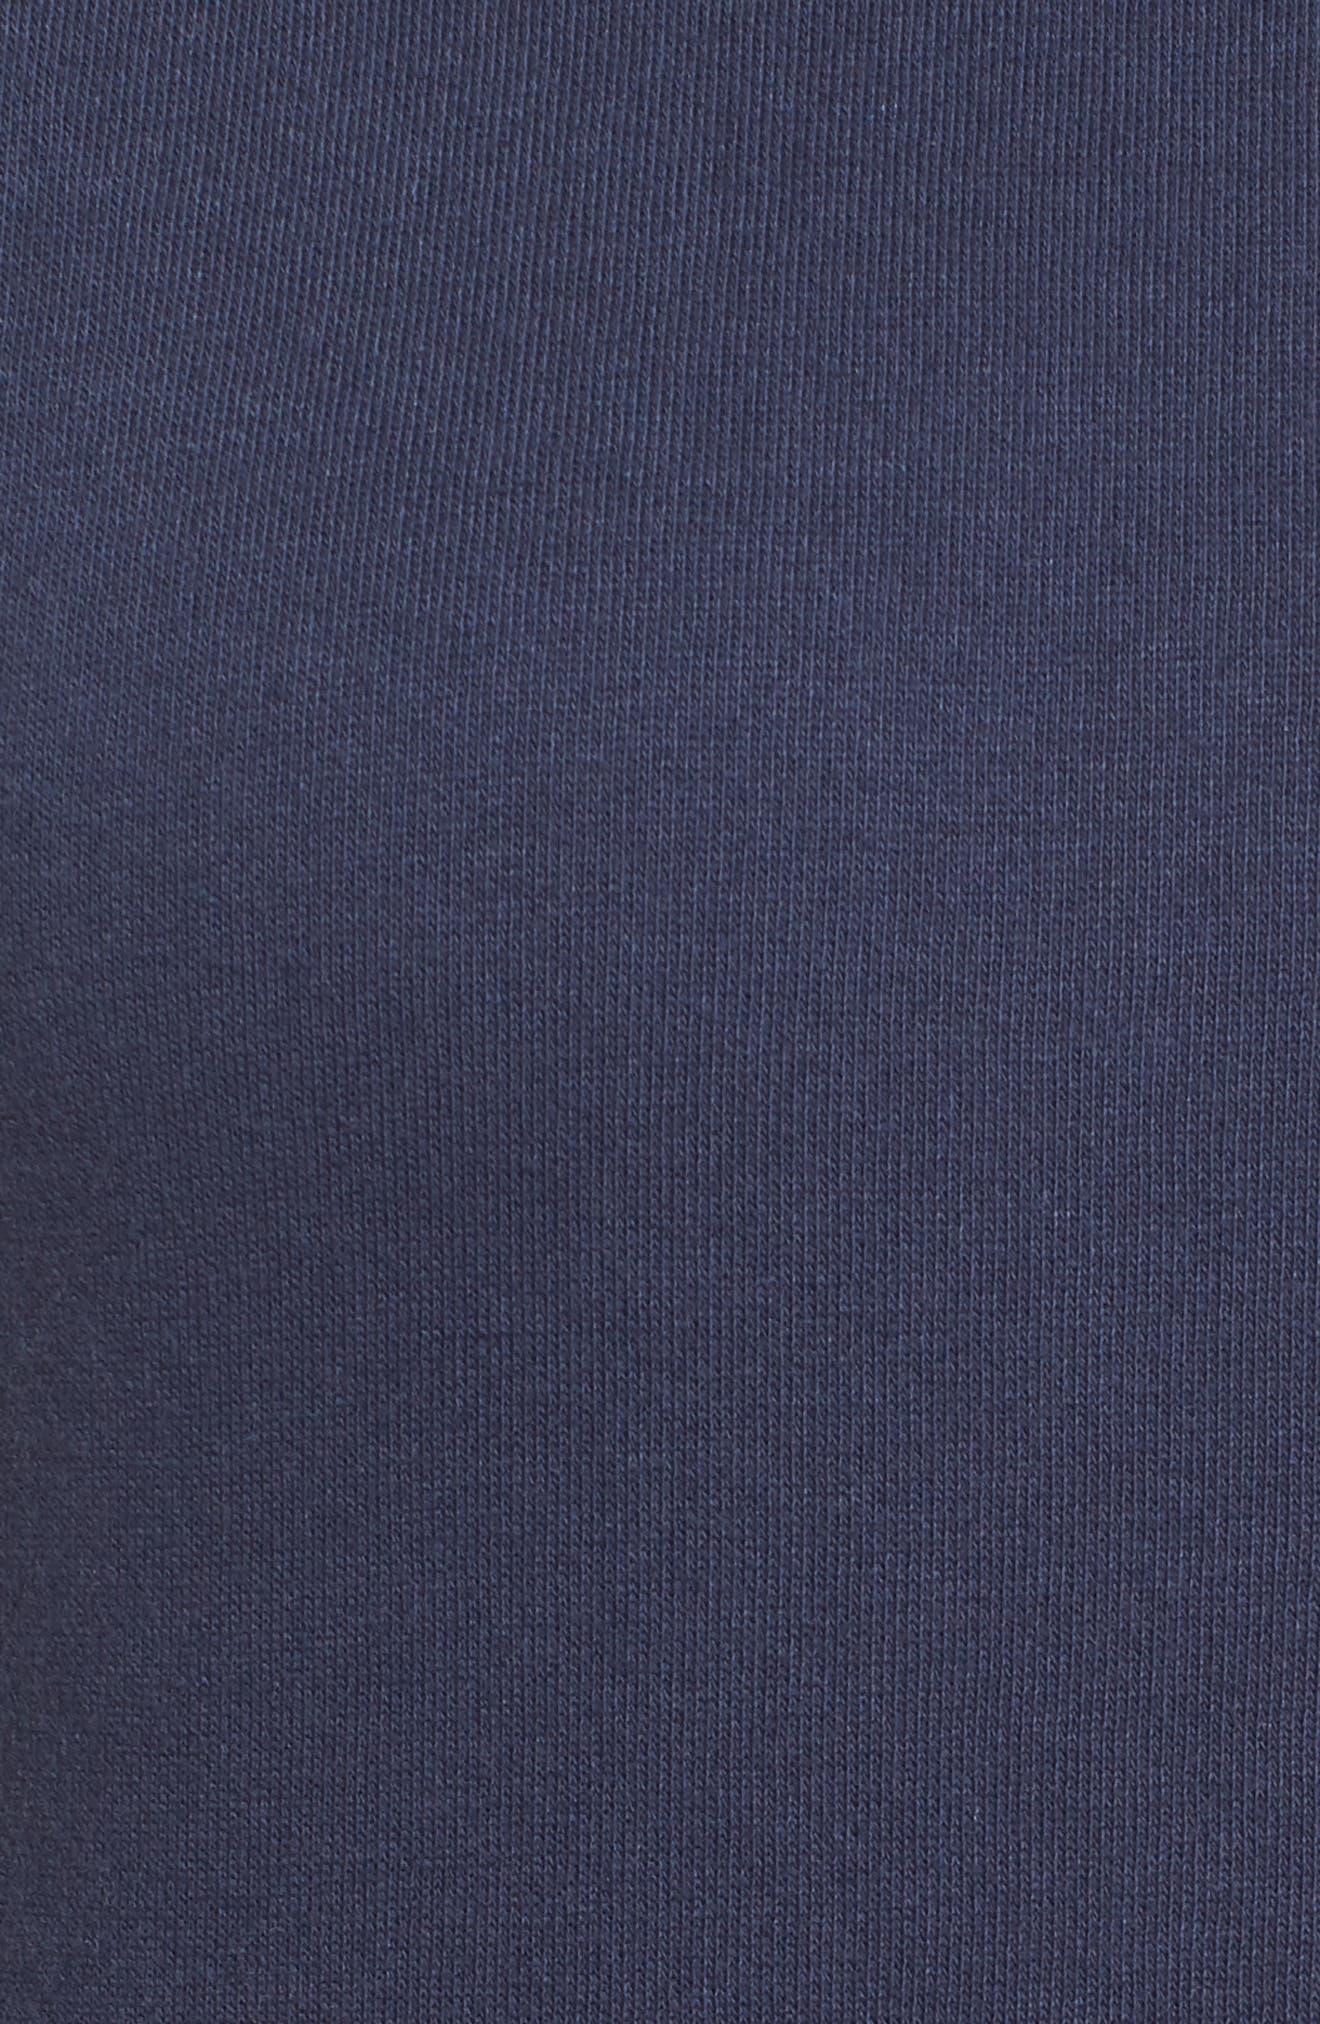 Tie Shoulder Shift Dress,                             Alternate thumbnail 11, color,